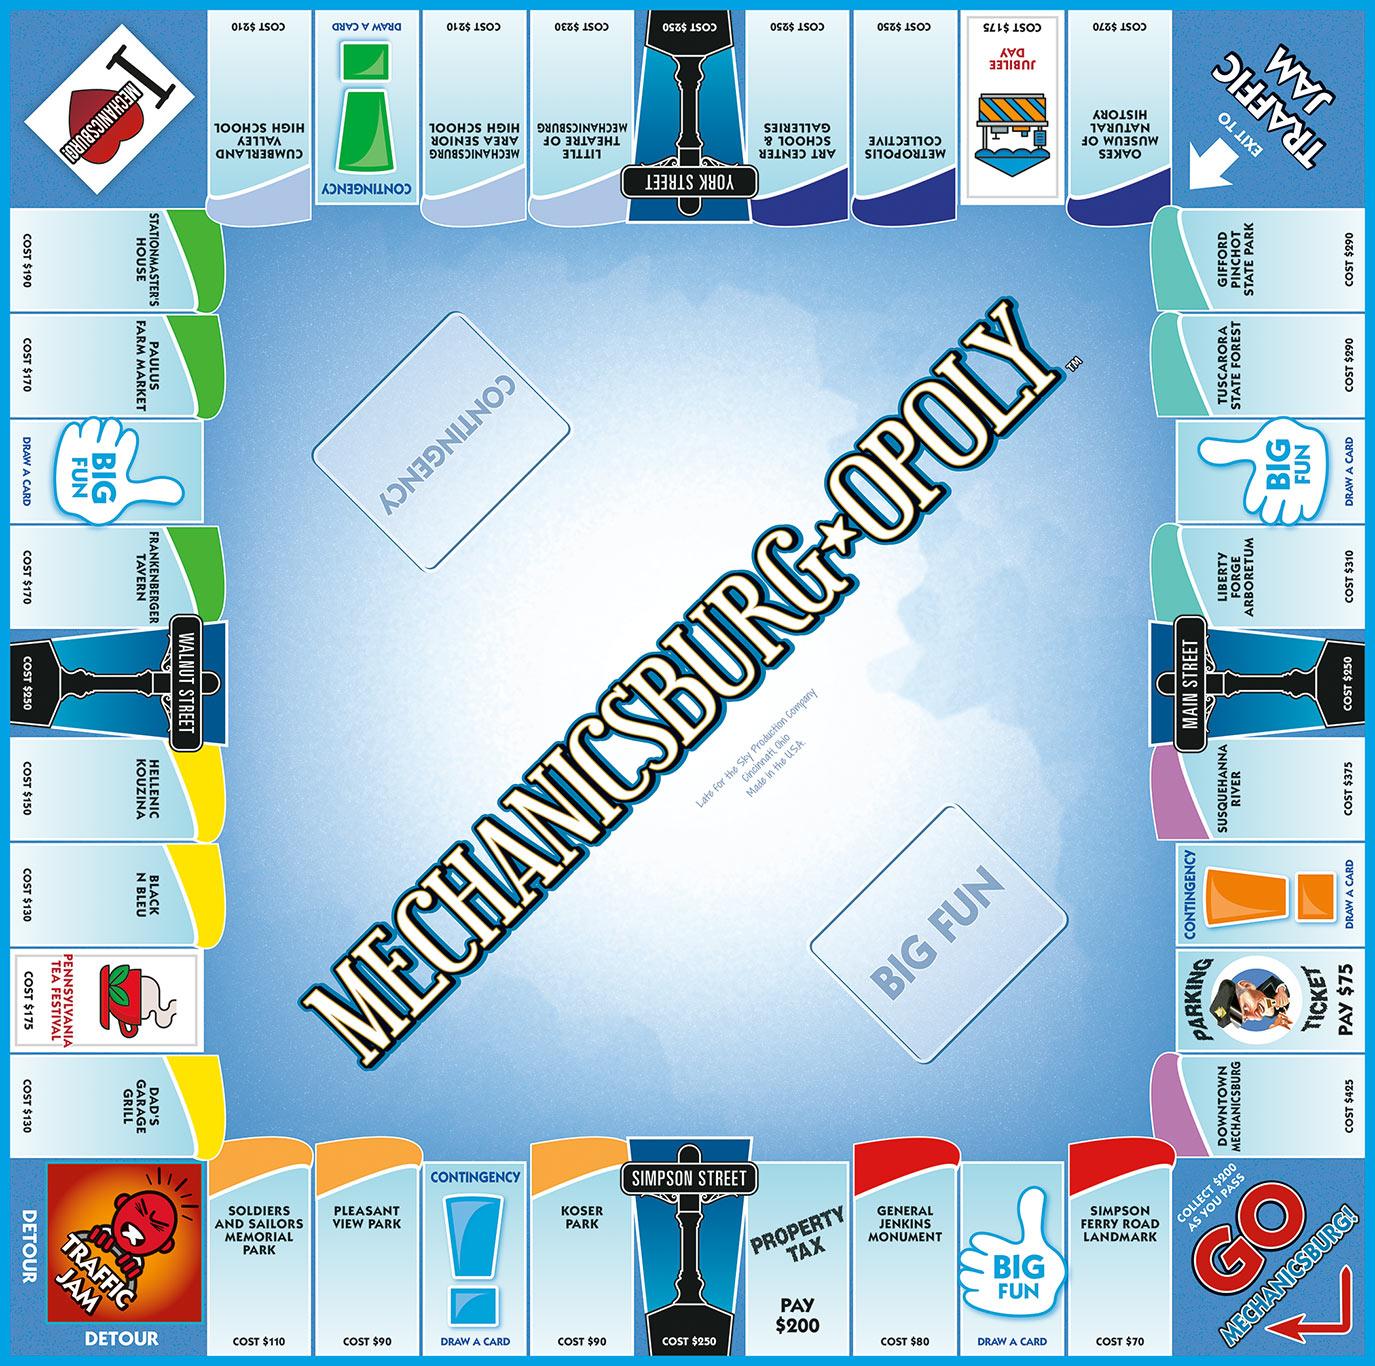 MECHANICSBURG-OPOLY Board Game